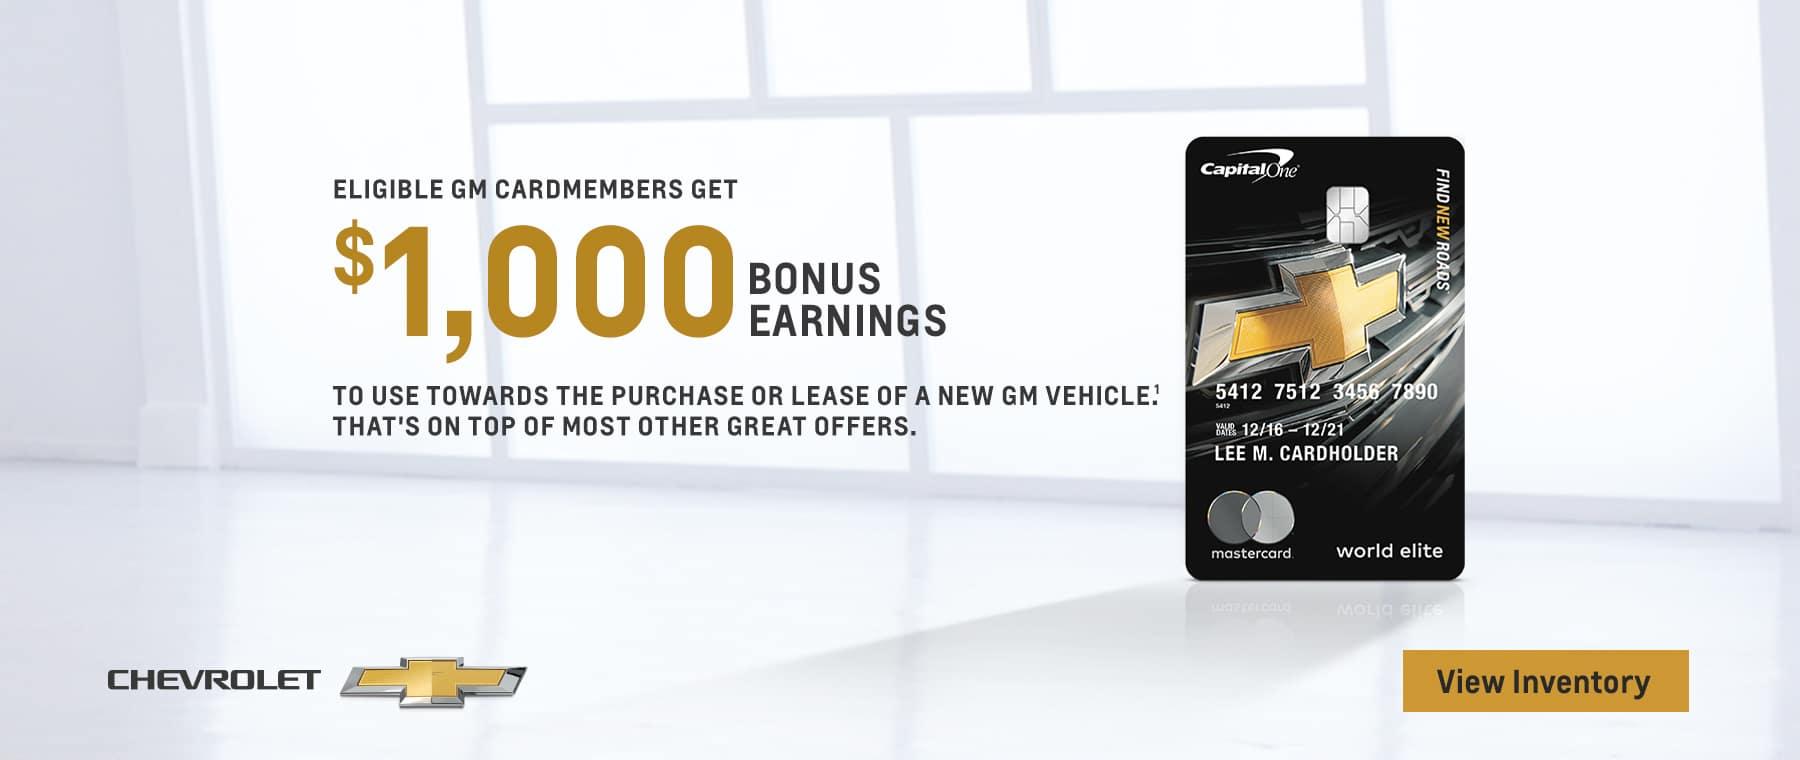 GM $1000 Bonus Earnings